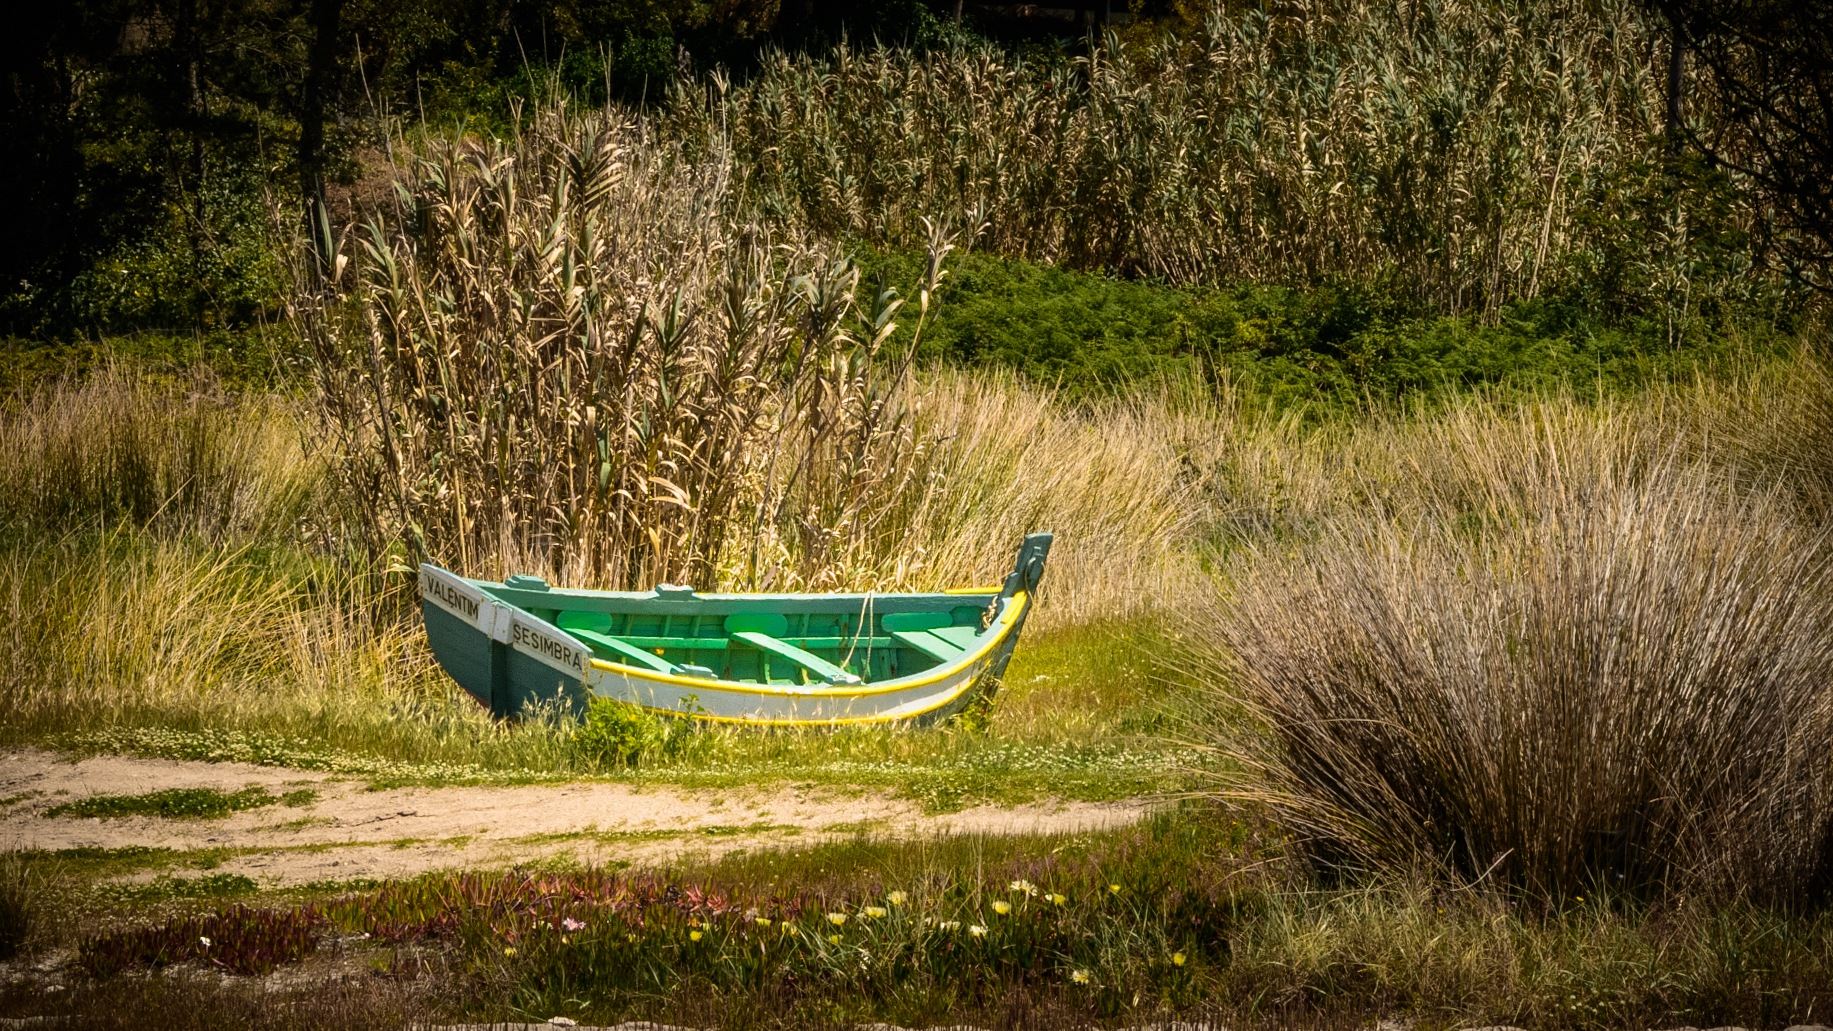 Barco Verde by Marcel Weichert